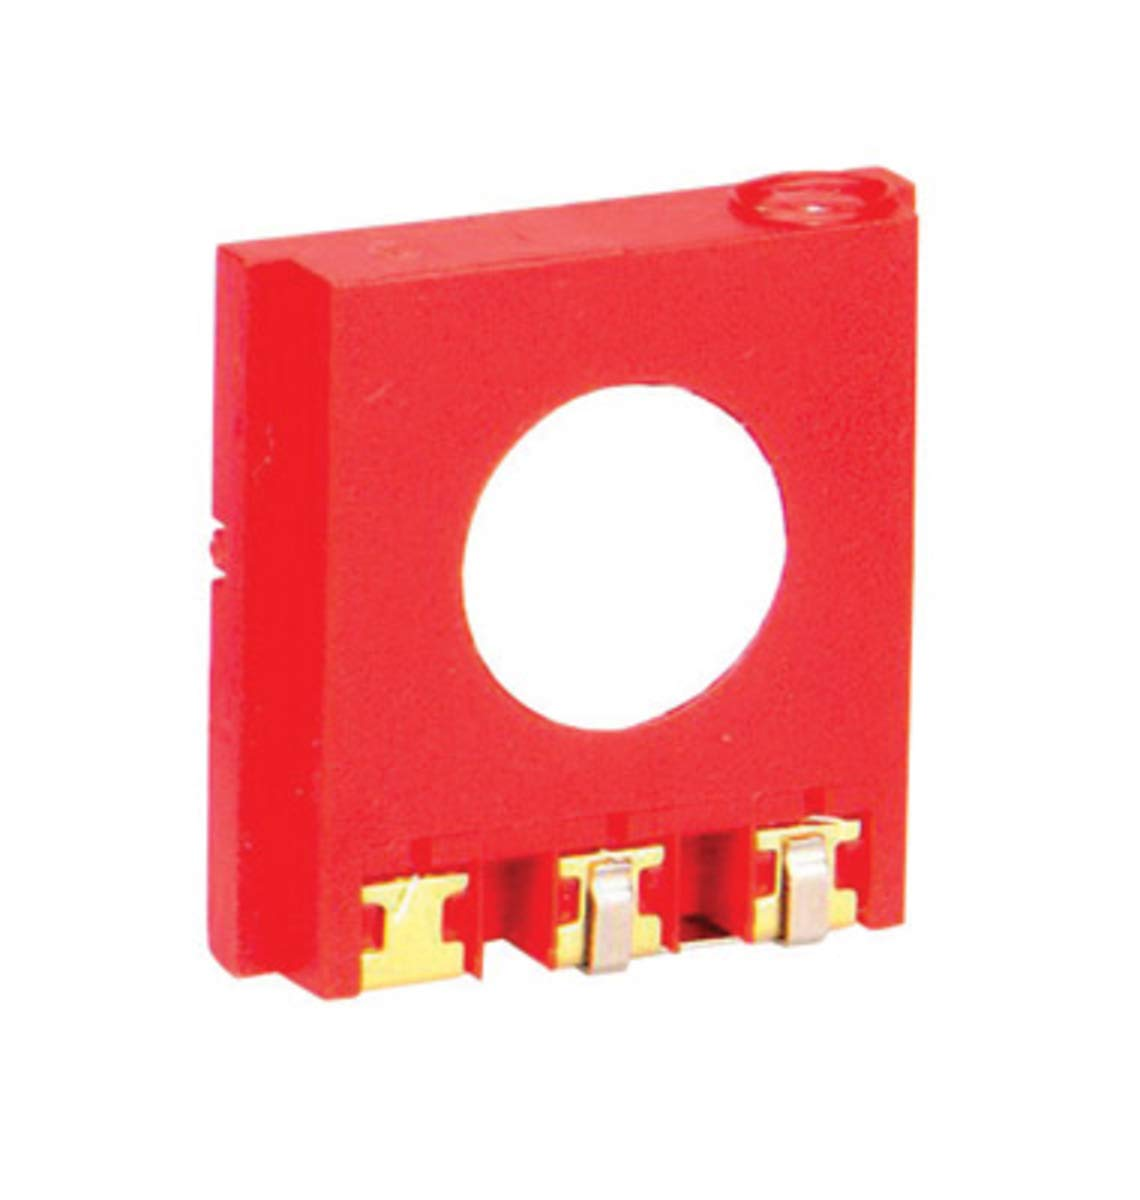 MICROceL carbon monoxide (CO) sensor, for GasAlertMicroClip and GasAlertMax XT II (SR-M-MC)